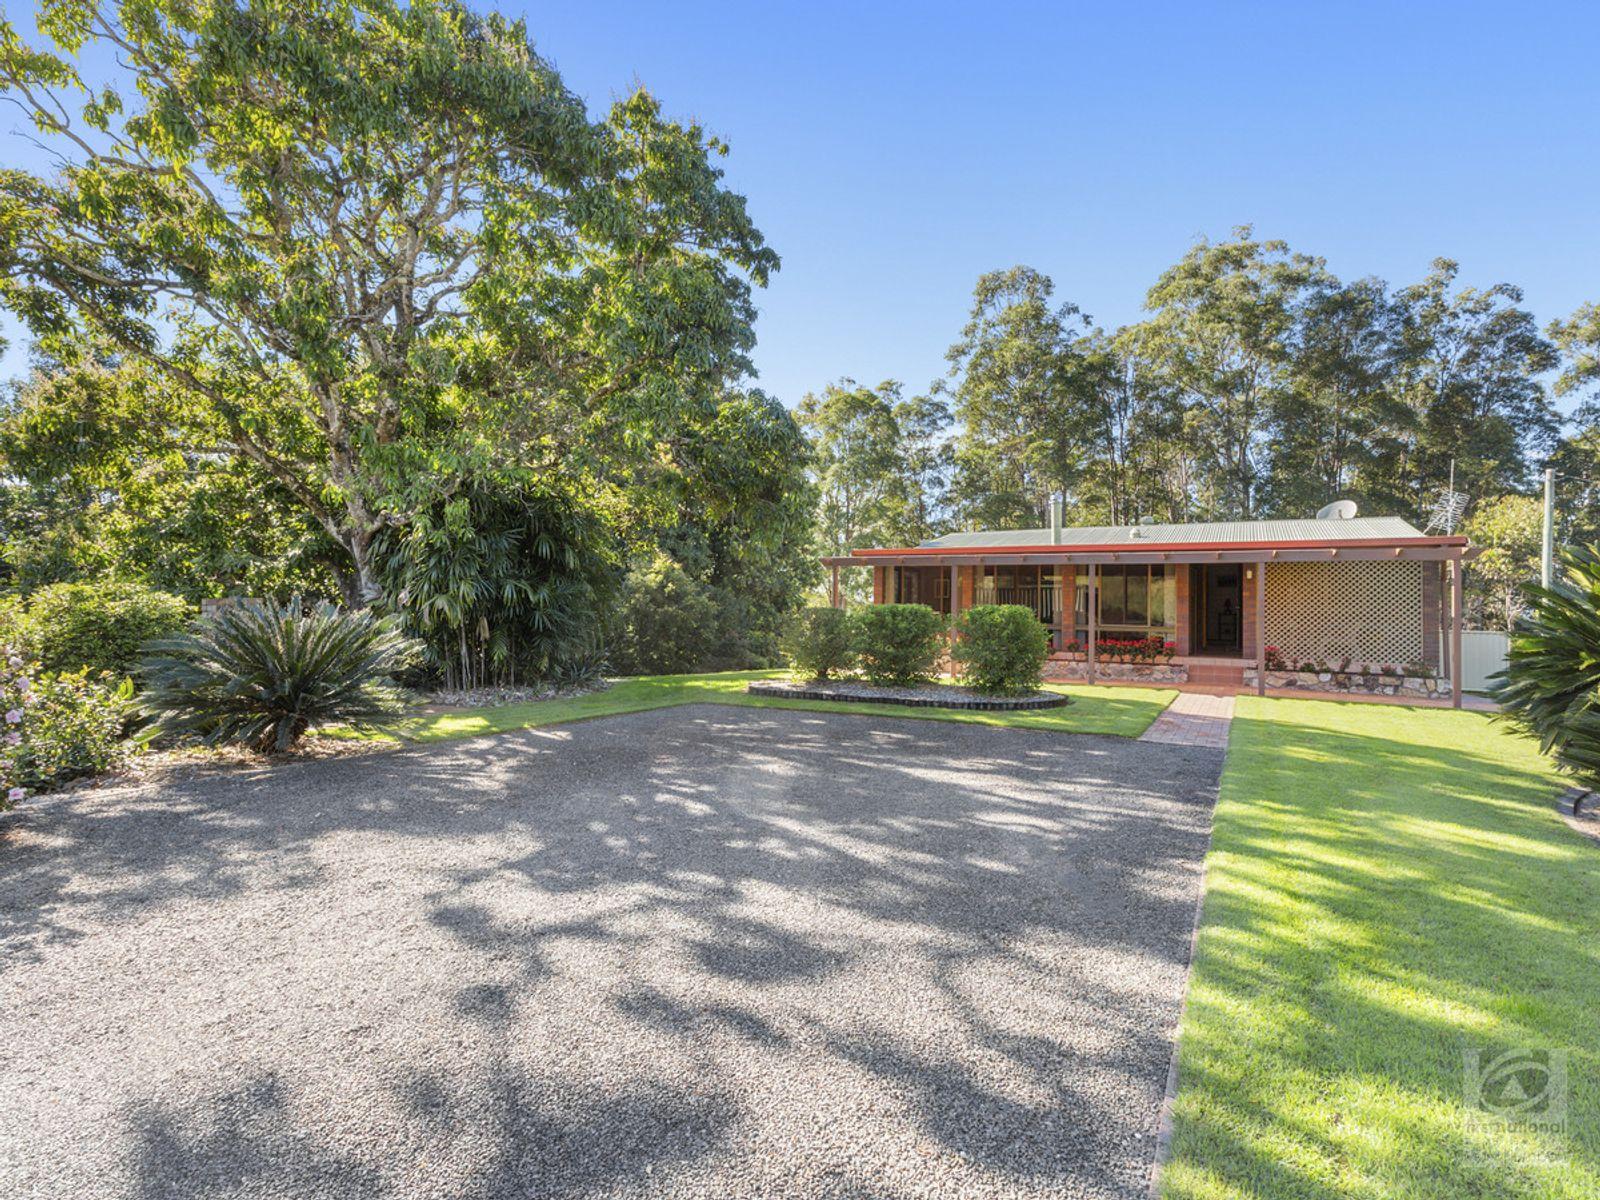 108 Campbells Road, Dungay, NSW 2484